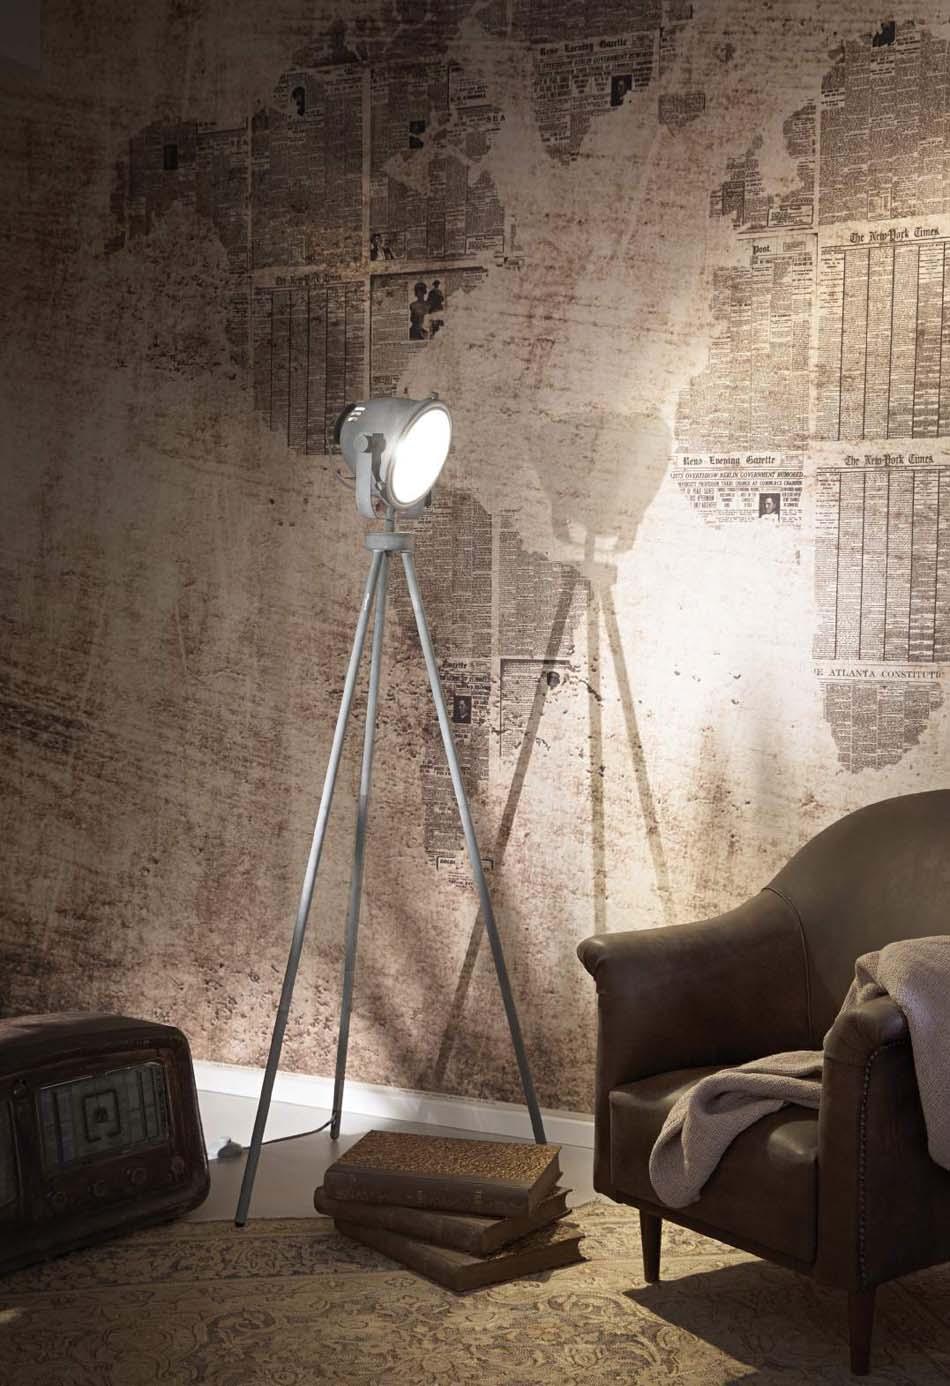 Lampade 46 Ideal Lux reflector – Toscana Arredamenti